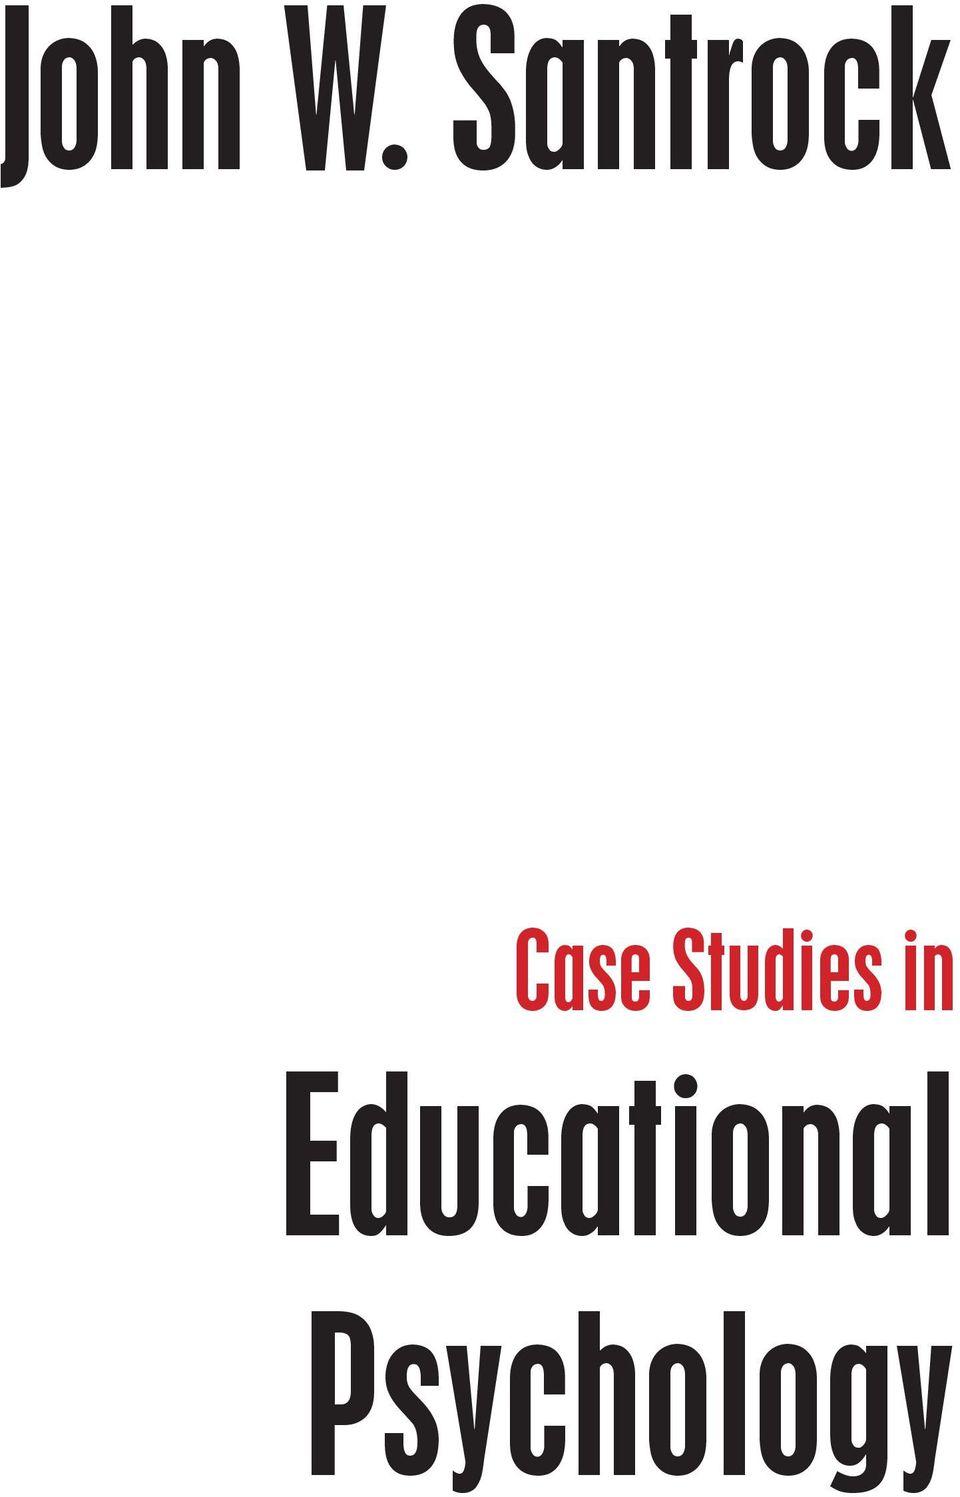 John W. Santrock. Case Studies in. Educational Psychology